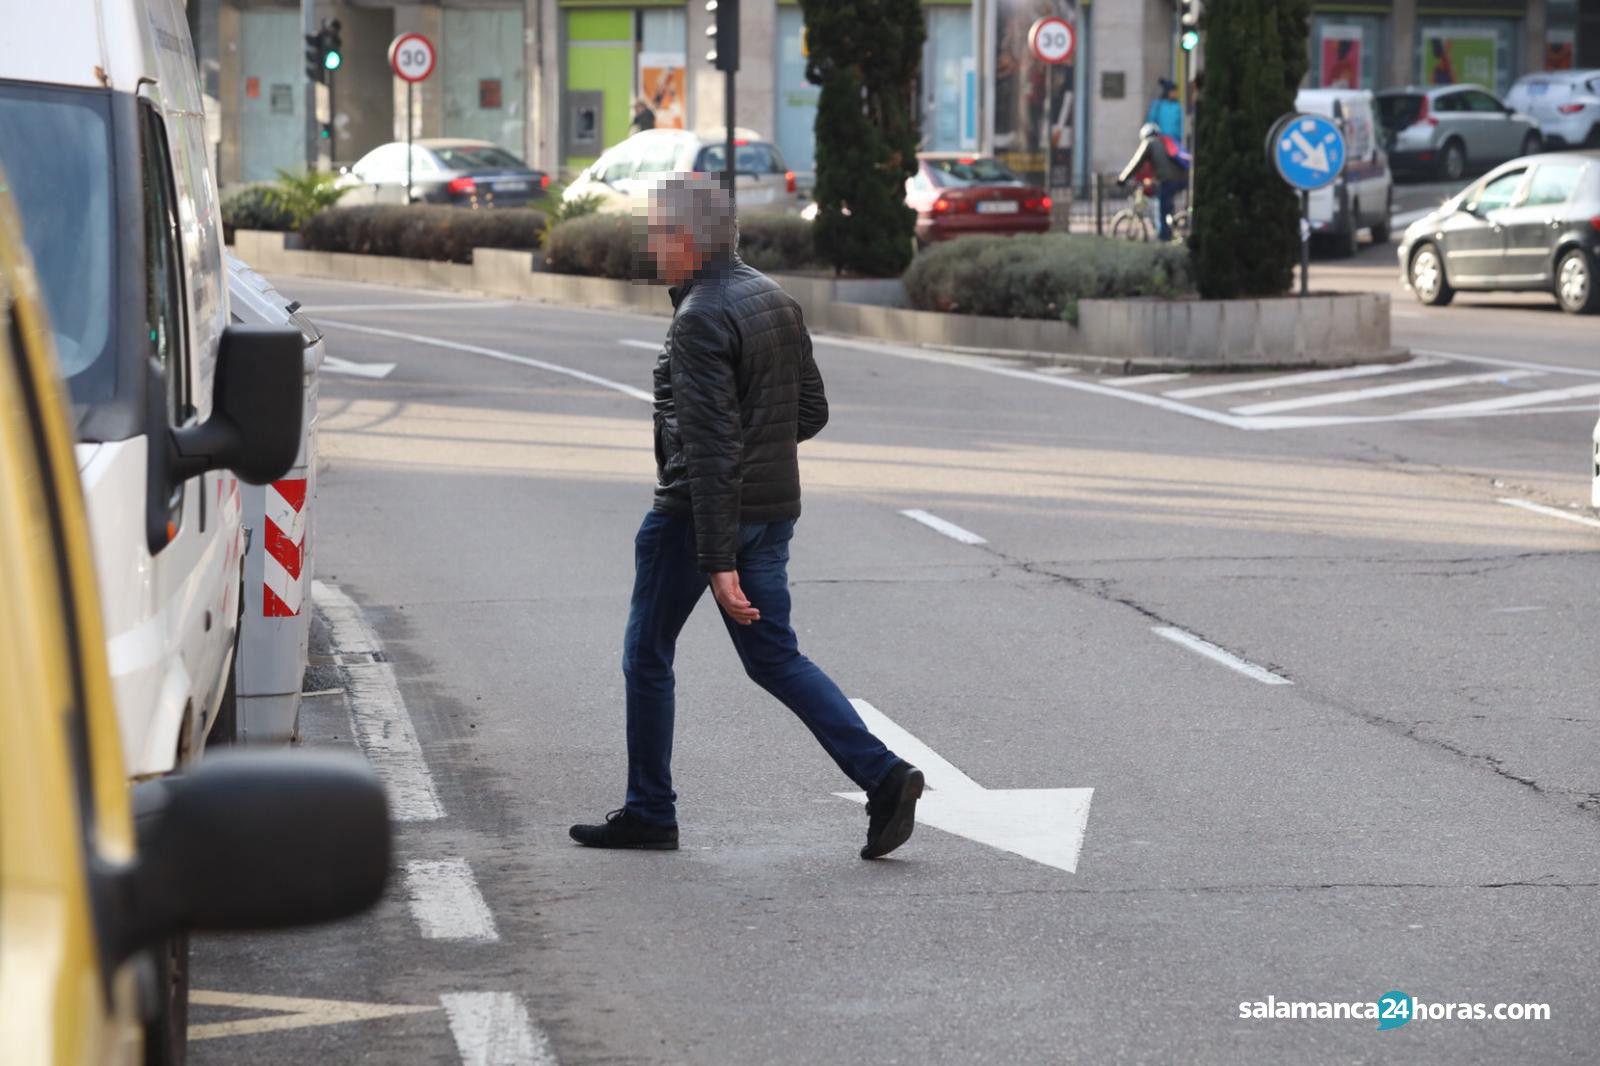 Peatones cruzando mal (1)